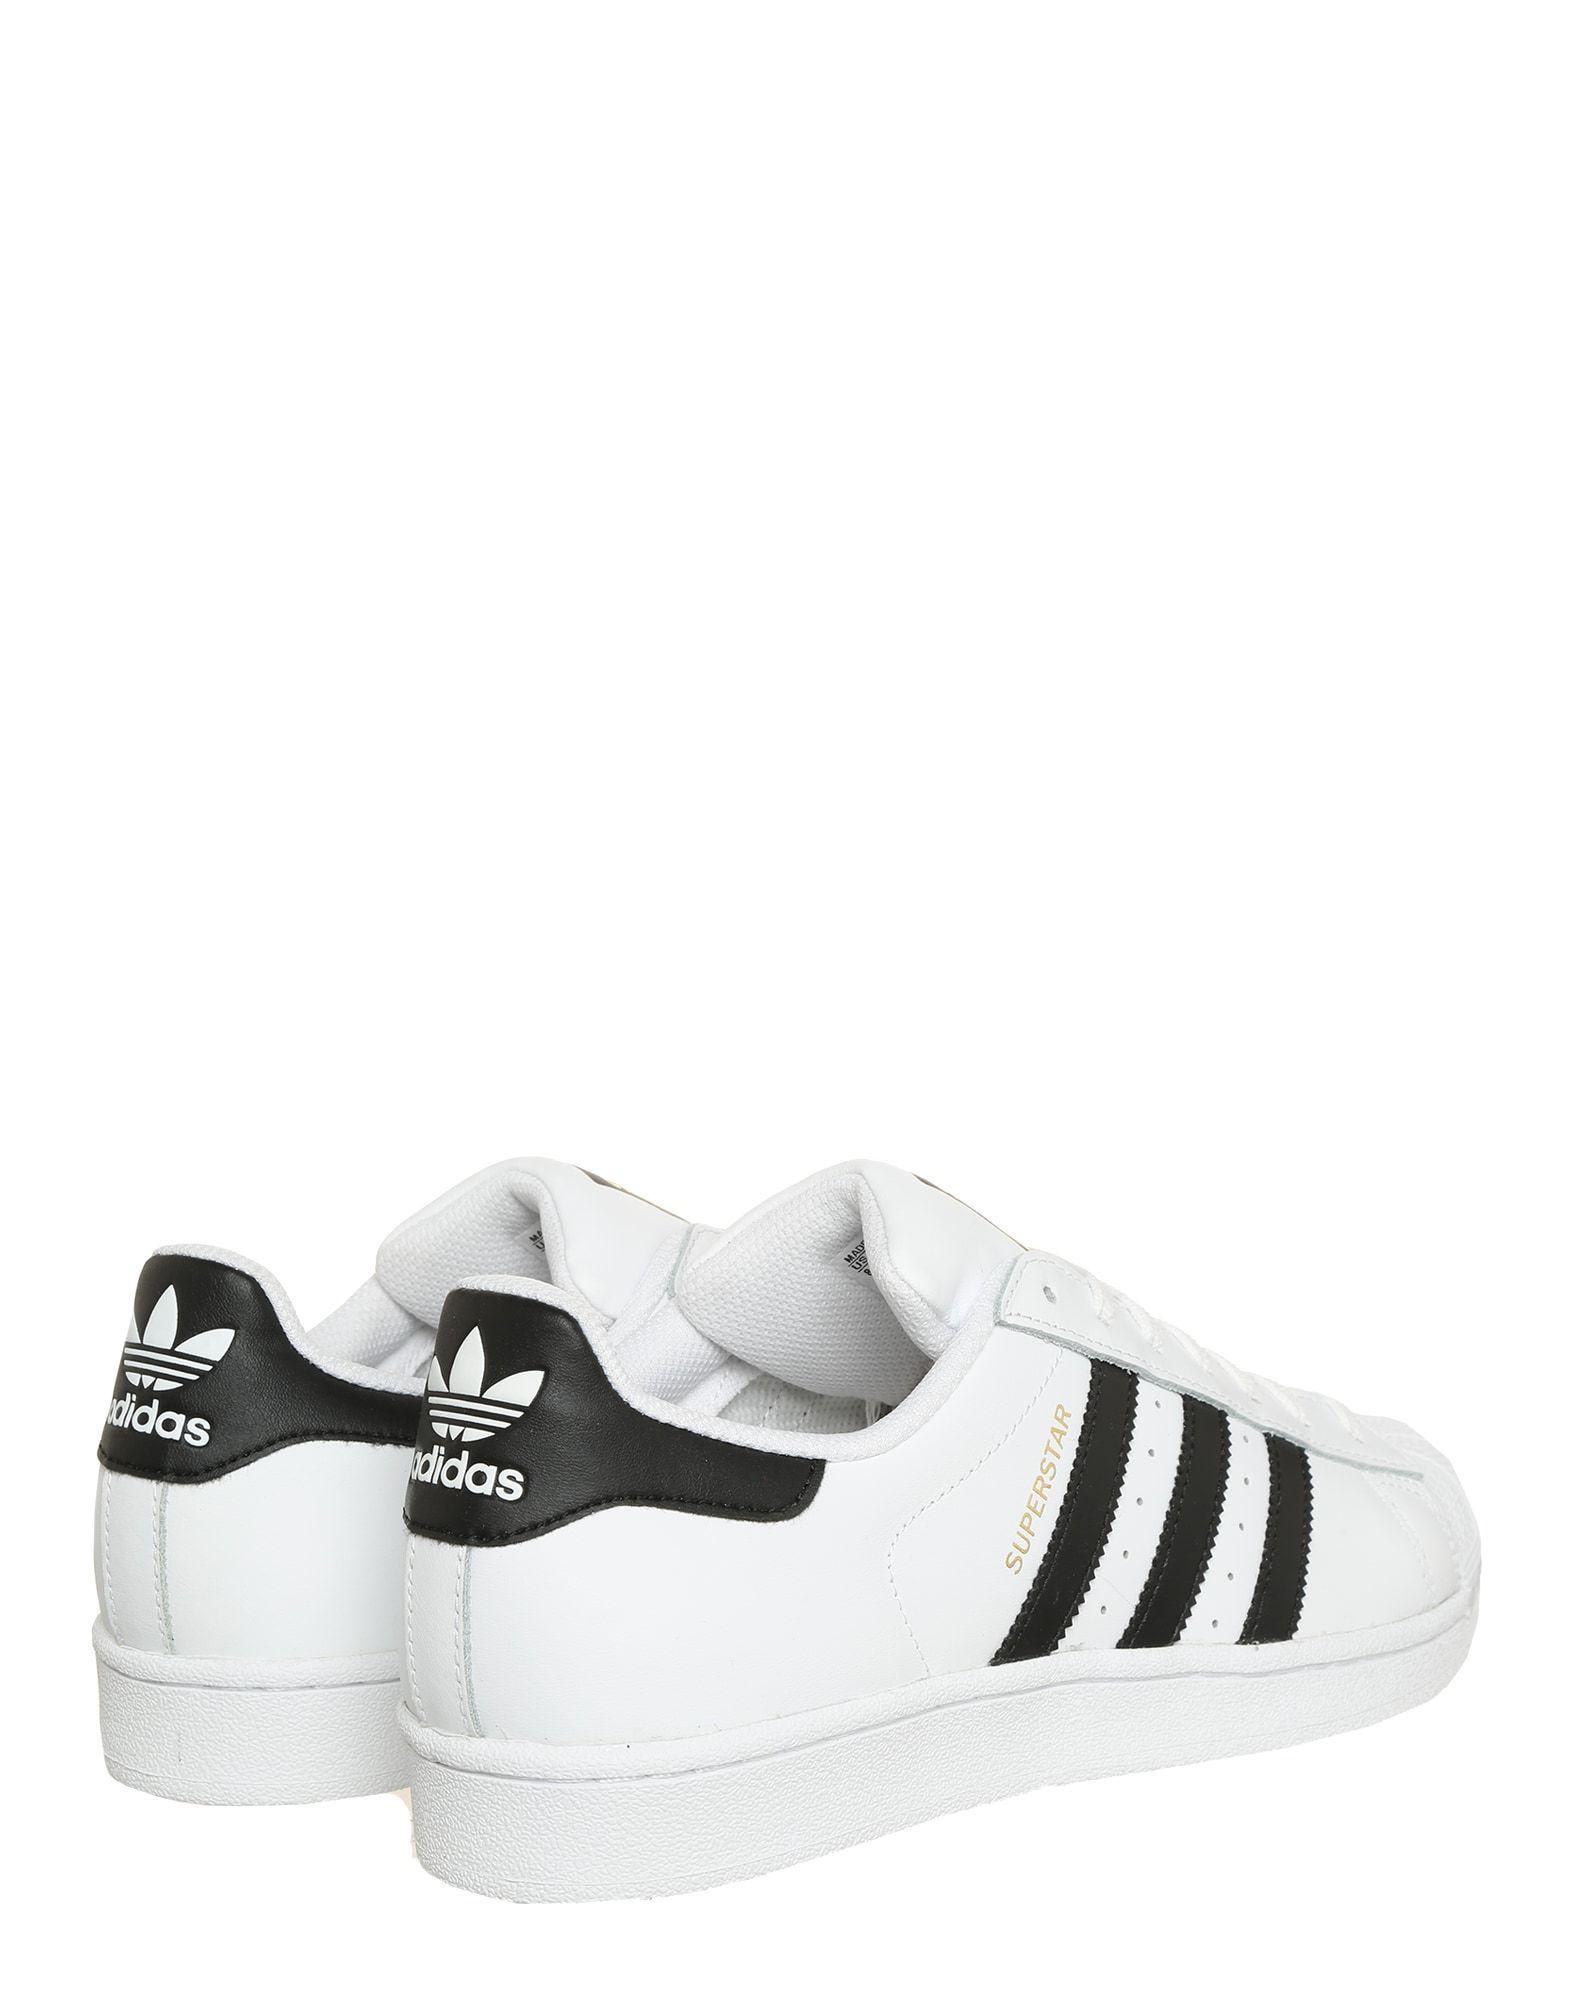 Adidas Originals Sneaker Superstar In Schwarz Weiss Adidasclothes Sneakers Adidas Superstar Adidas Superstar Sneaker